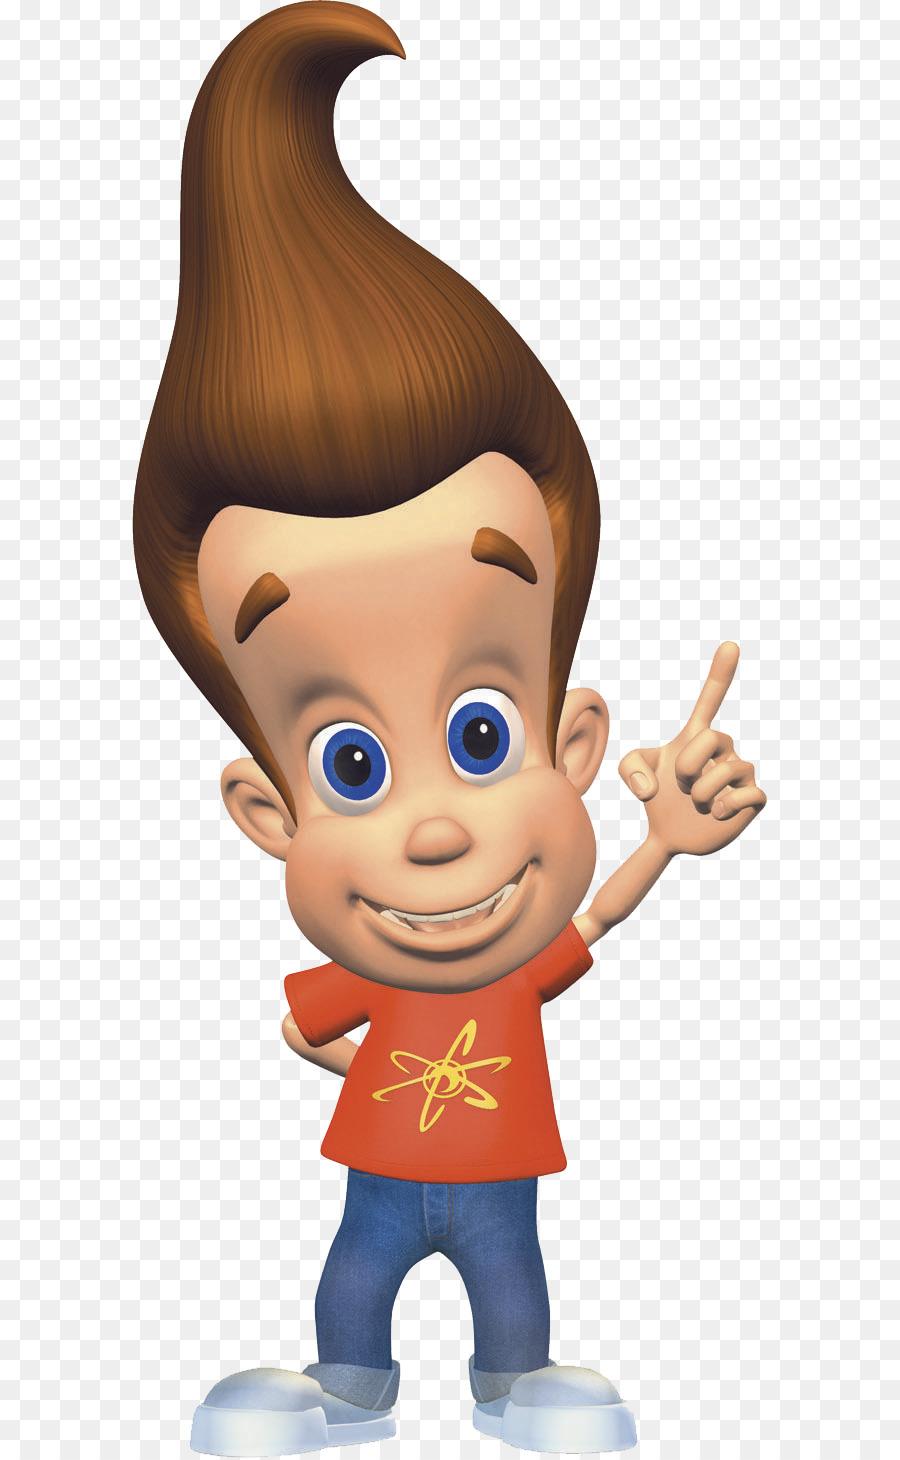 Download jimmy neutron clipart Jimmy Neutron: Boy Genius UltraLord ...